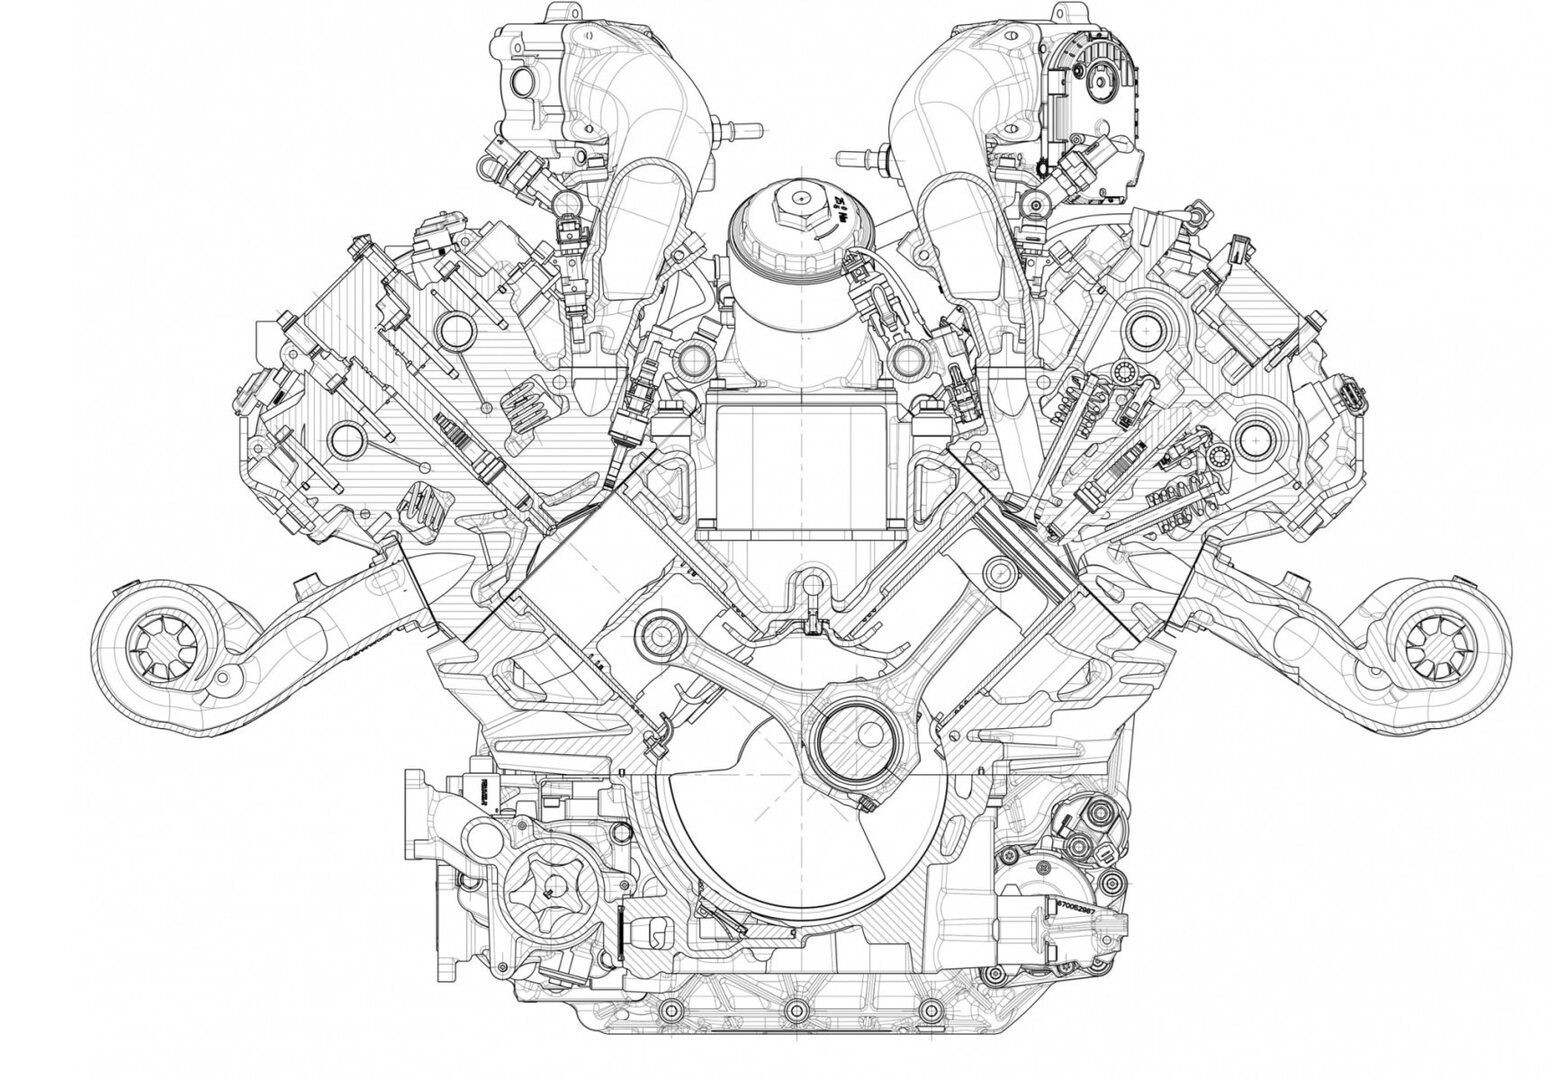 Новый движок Maserati получил технологии Формулы-1